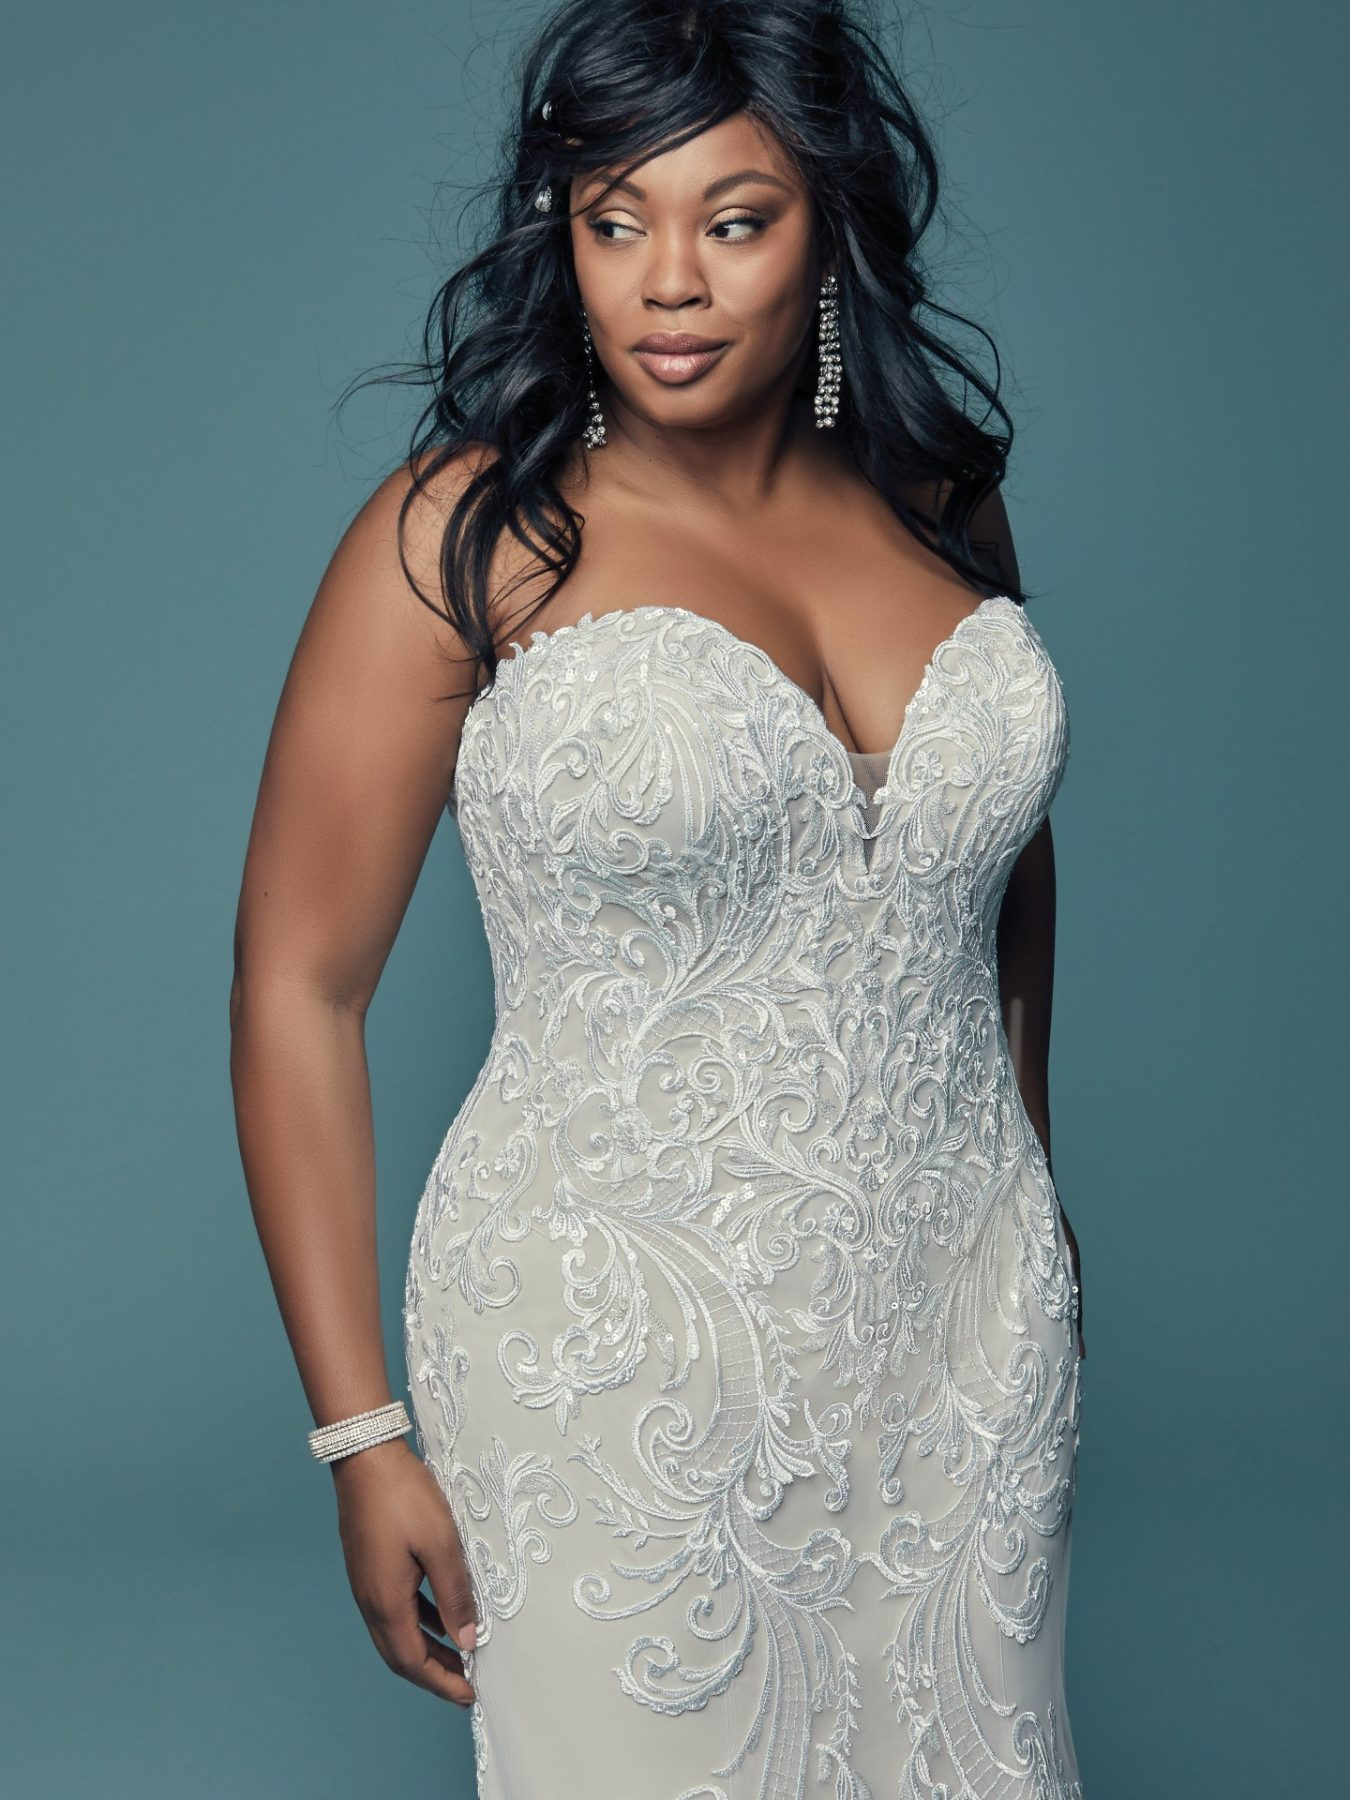 22 Designer Plus-Size Wedding Dresses That Prove Your Body is ...